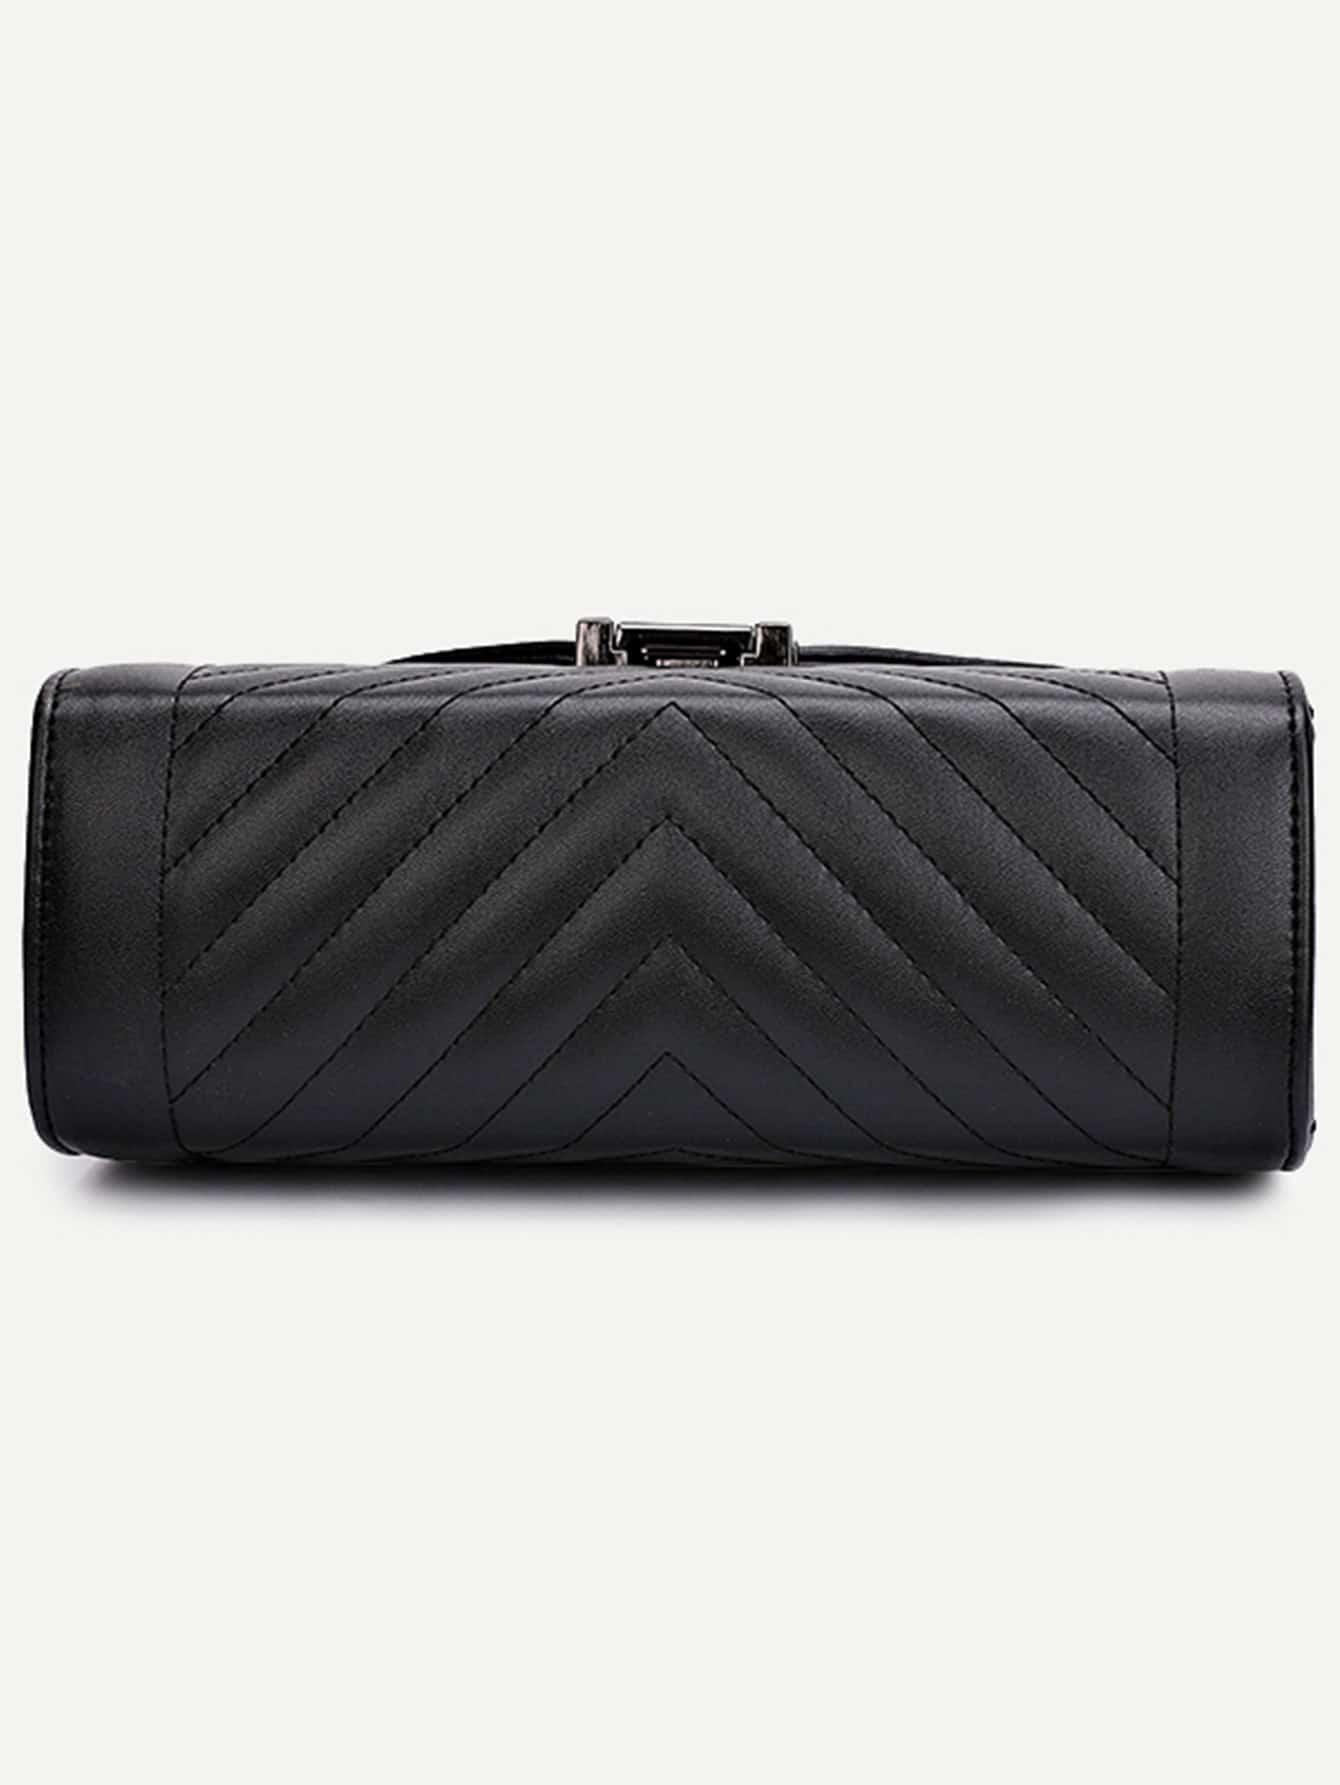 bag160819308_2